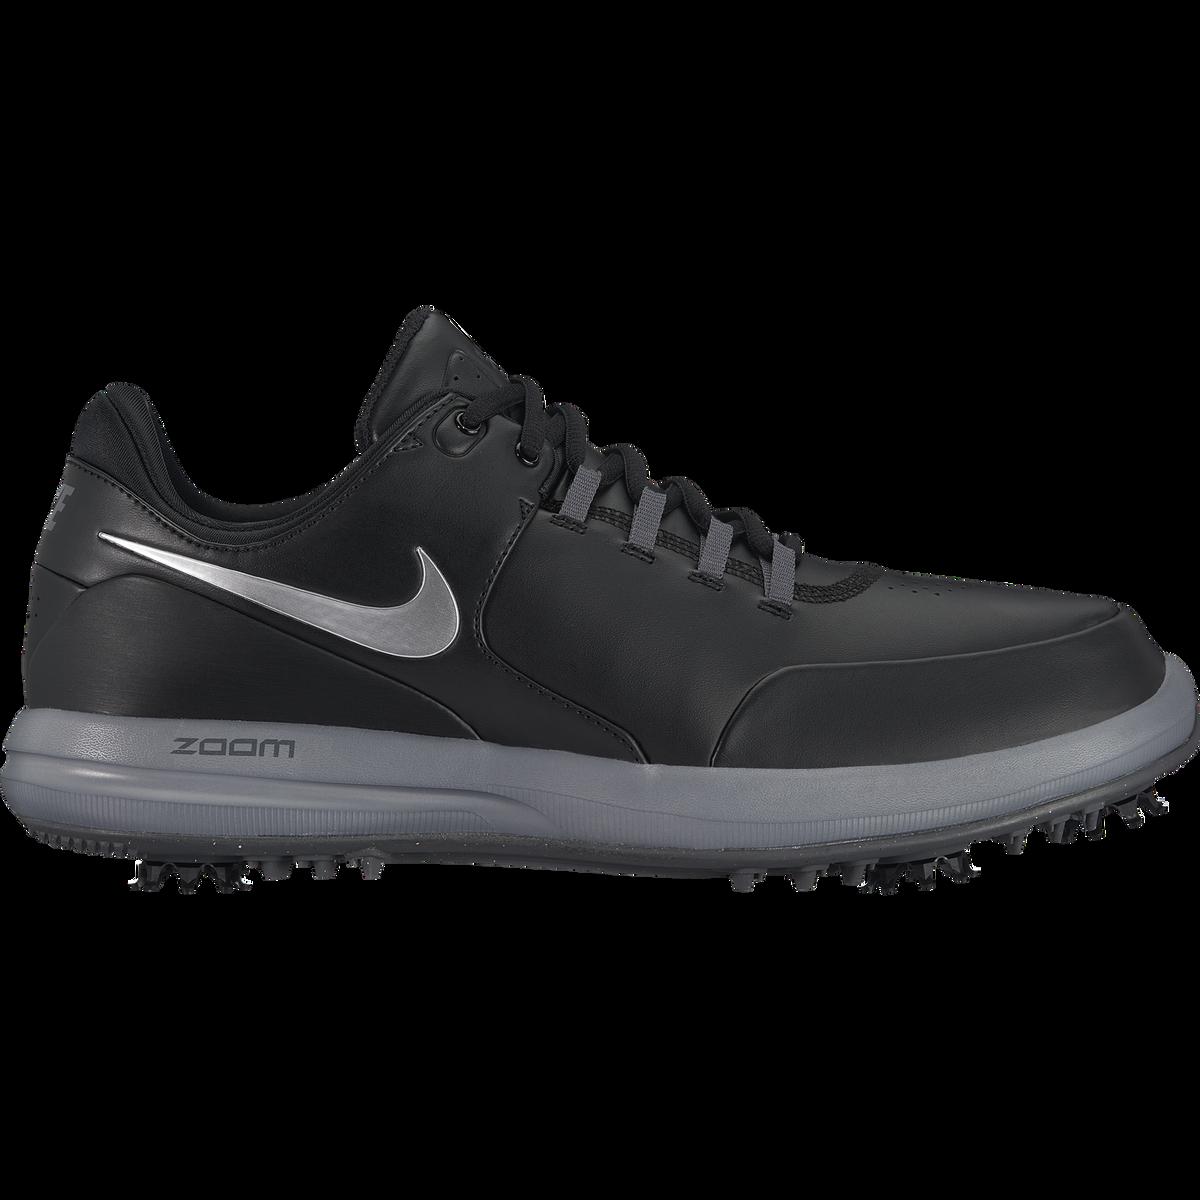 b36b69258b Nike Air Zoom Accurate Men's Golf Shoe - Black/White | PGA TOUR ...